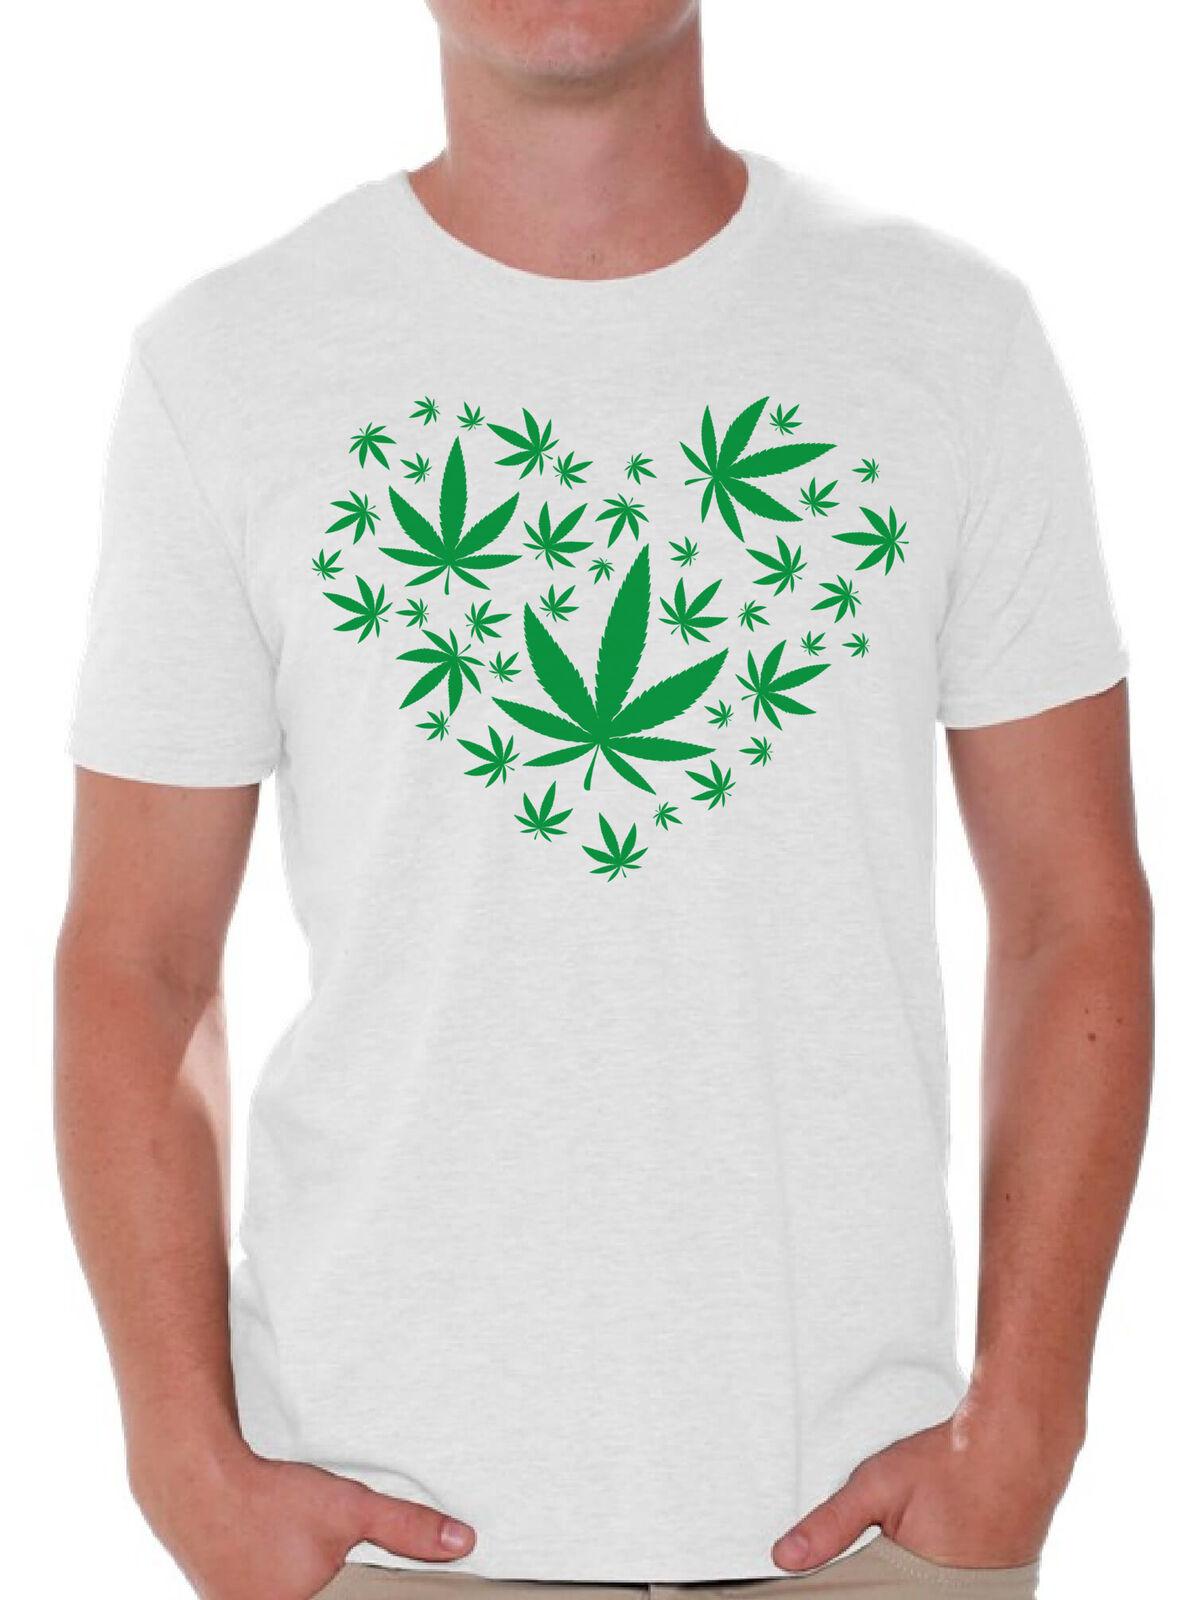 I Love Marijuana Mens T Shirt Weed Leaf 420 Shirt Cannabis Tee for Men 1